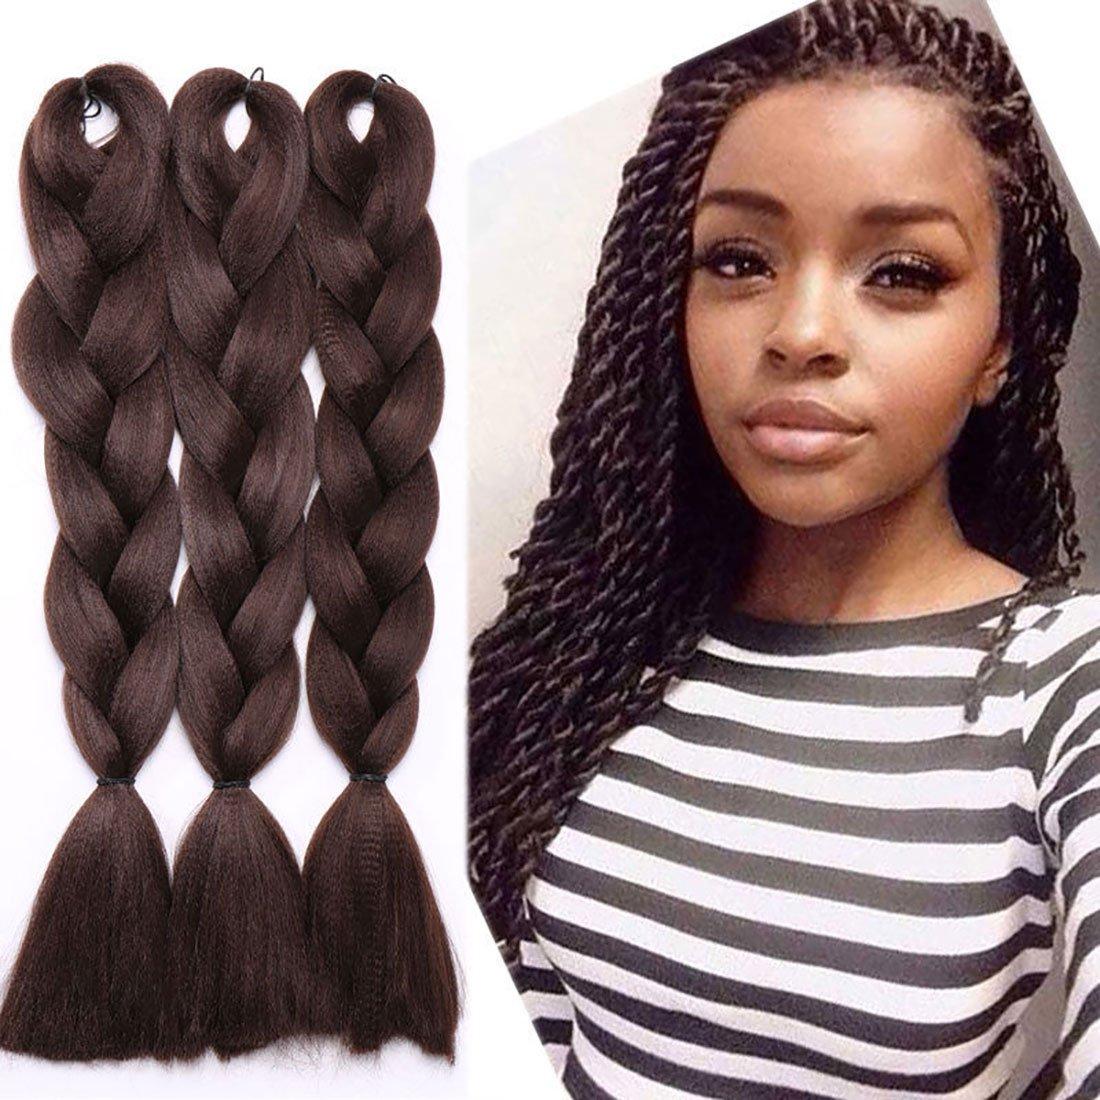 3 Pcs300g 24 Two Ombre Kanekalon Braiding Hair Synthetic Braid